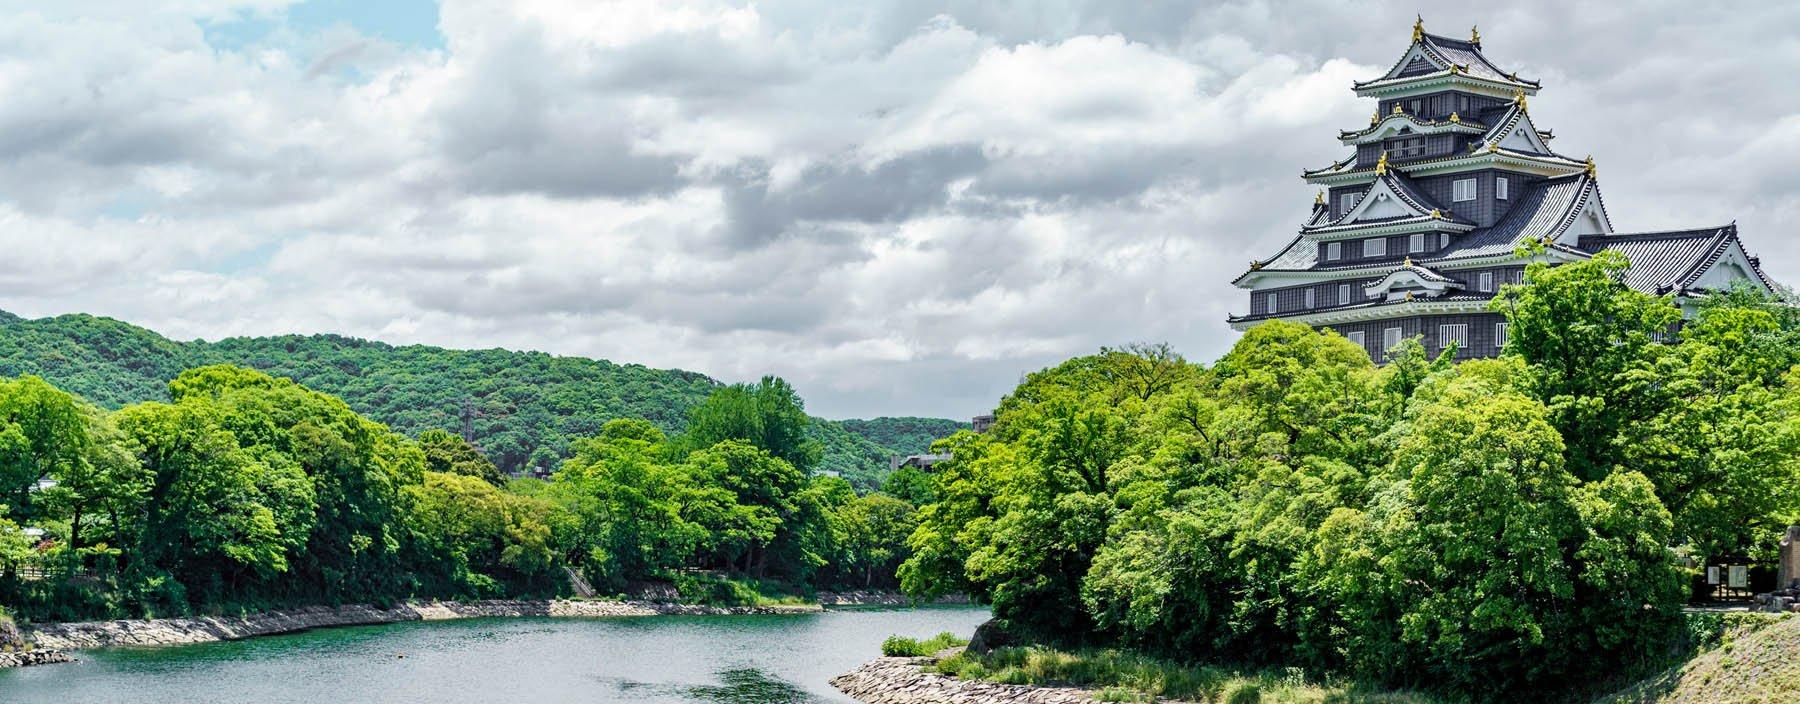 jp, okayama, okayama kasteel en rivier (1).jpg